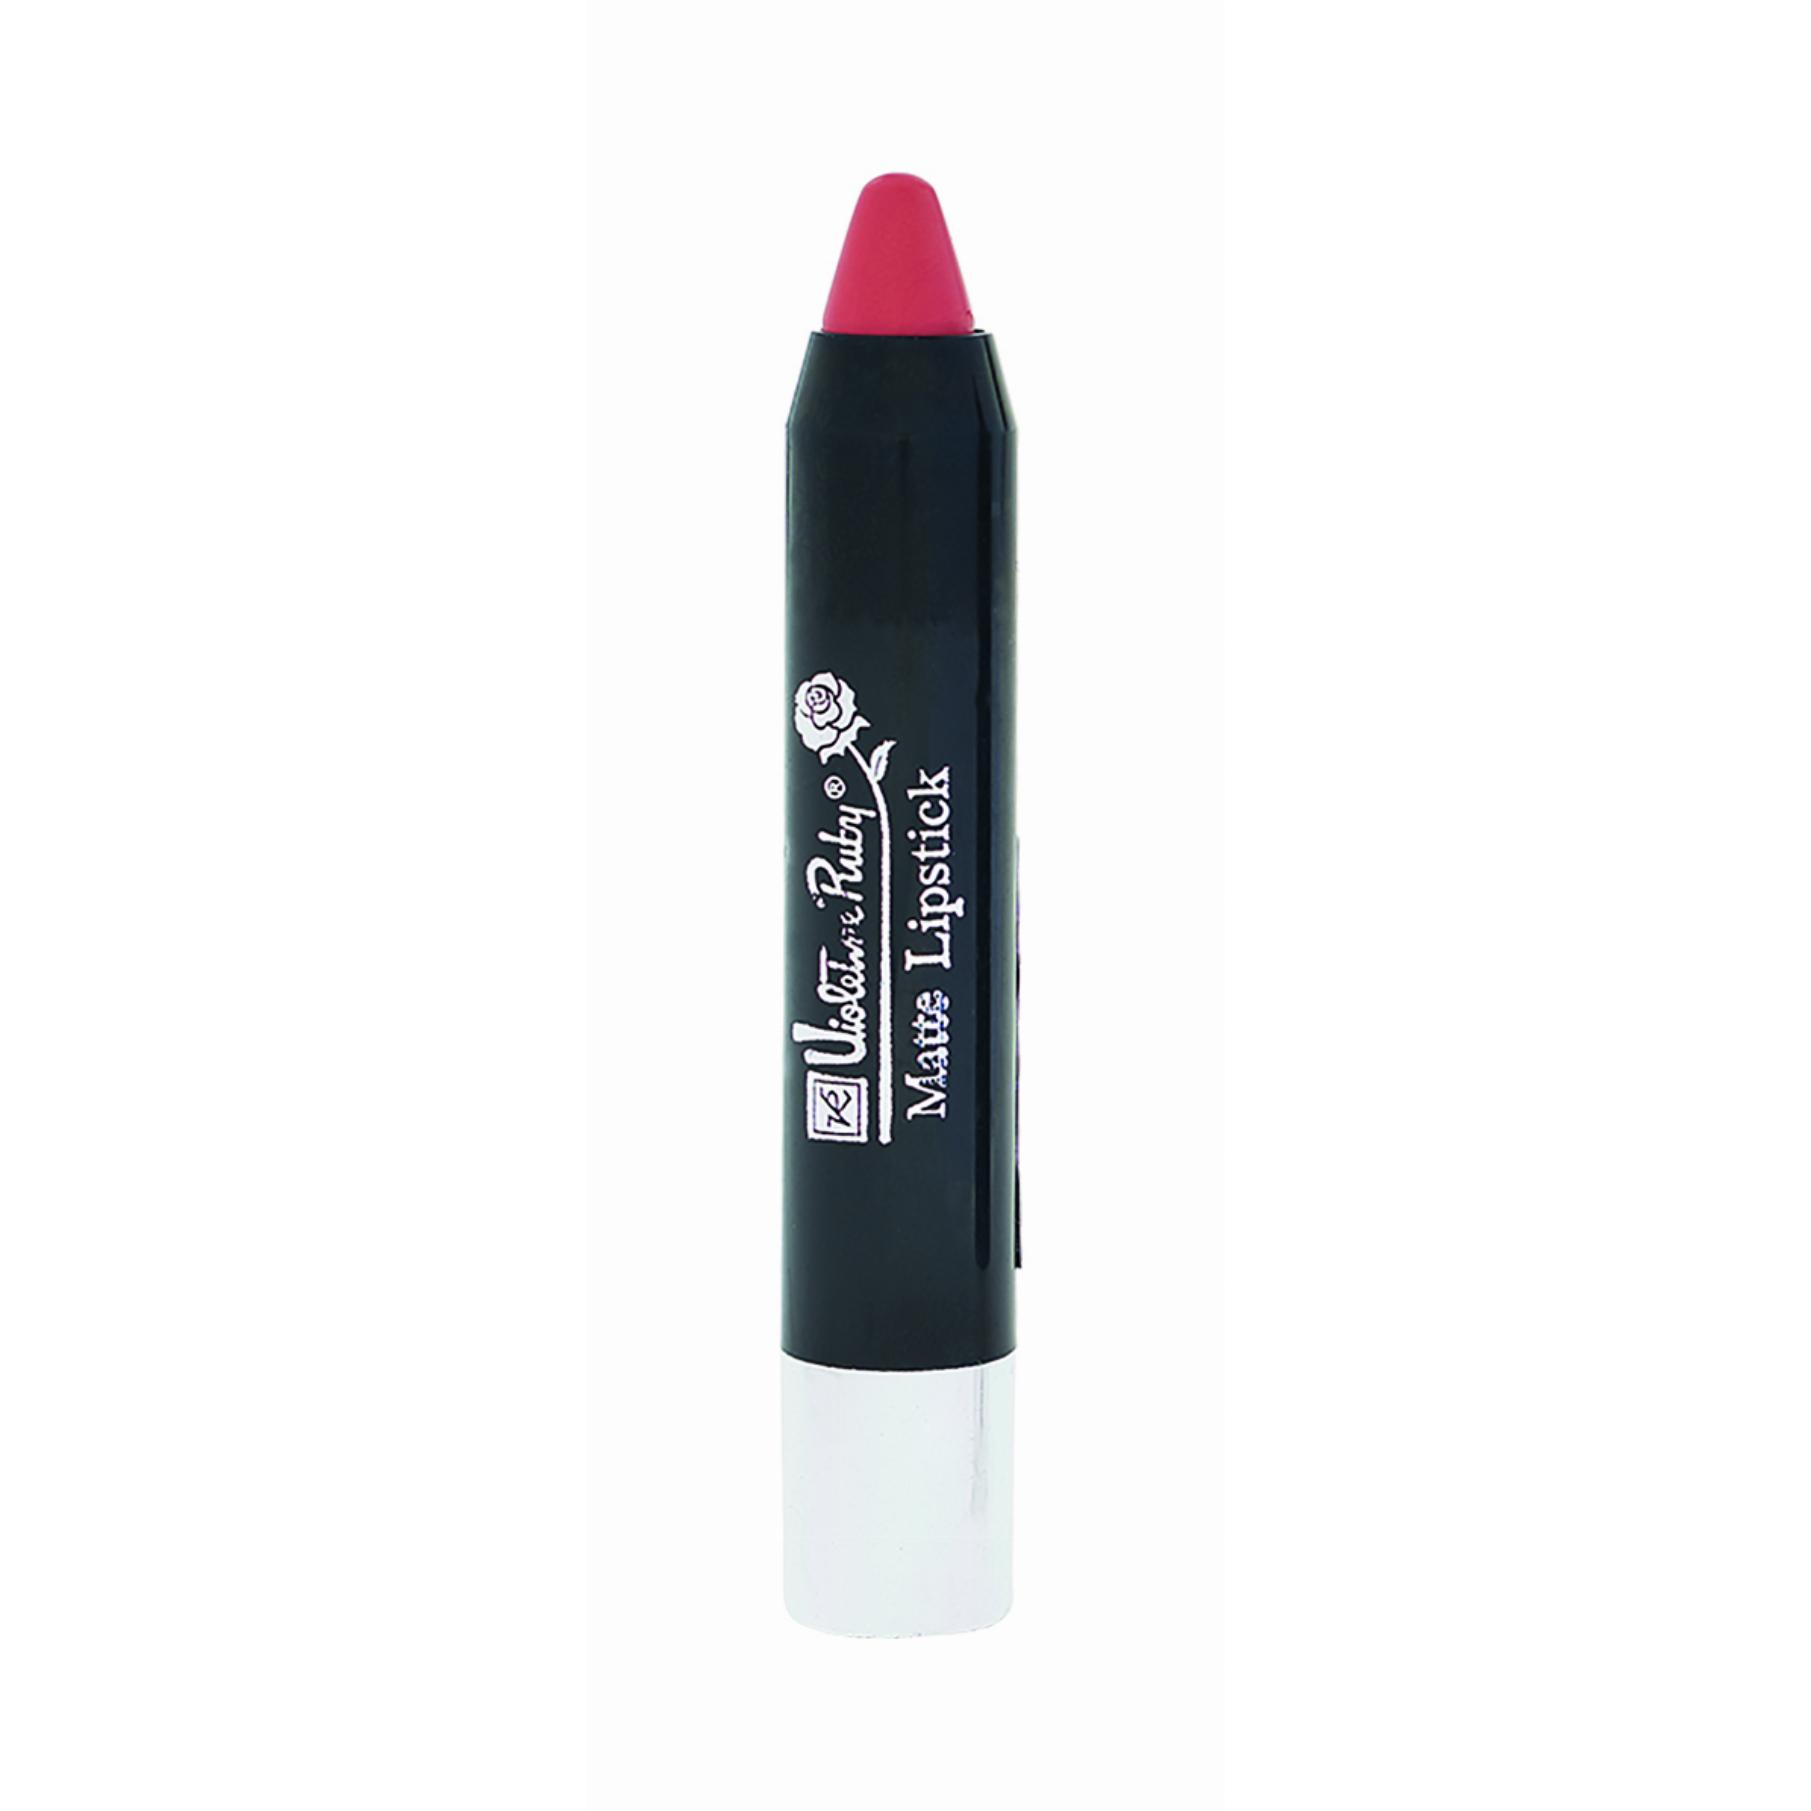 Lipstik Matte P03 Nude | VIOLETINE RUTY